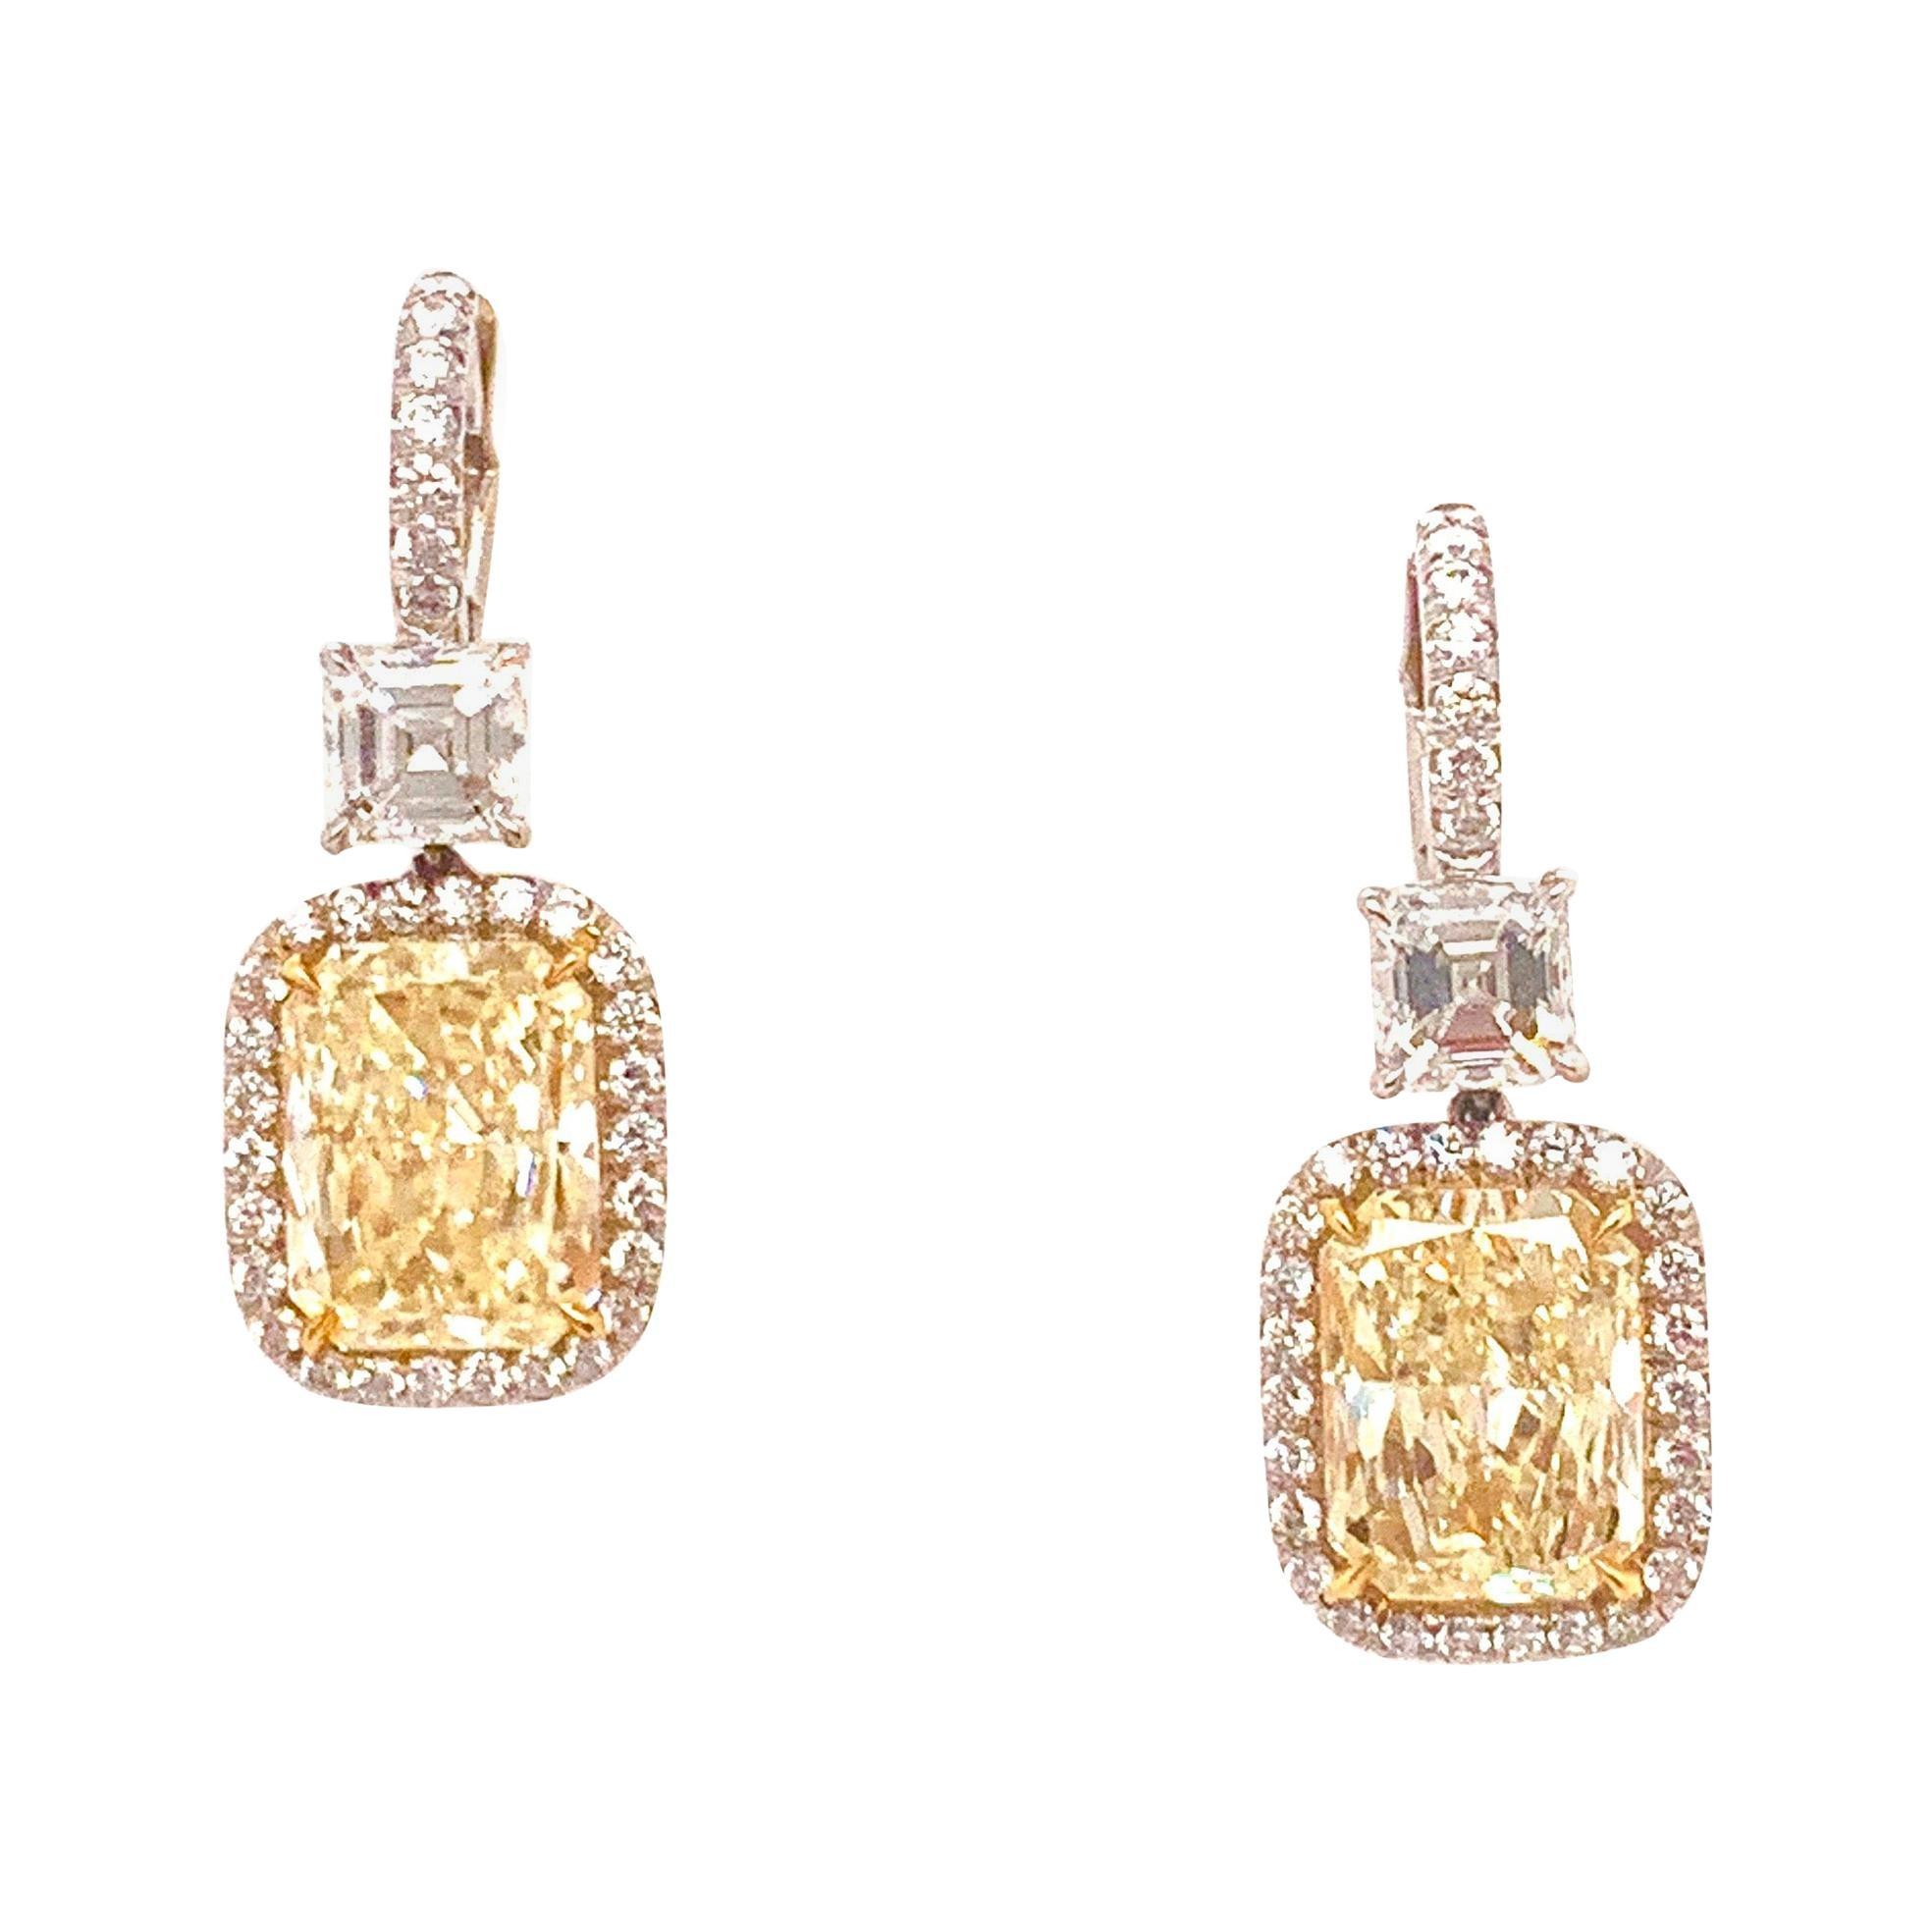 5.50 Carat Yellow Radiant Cut Diamond Halo Earrings